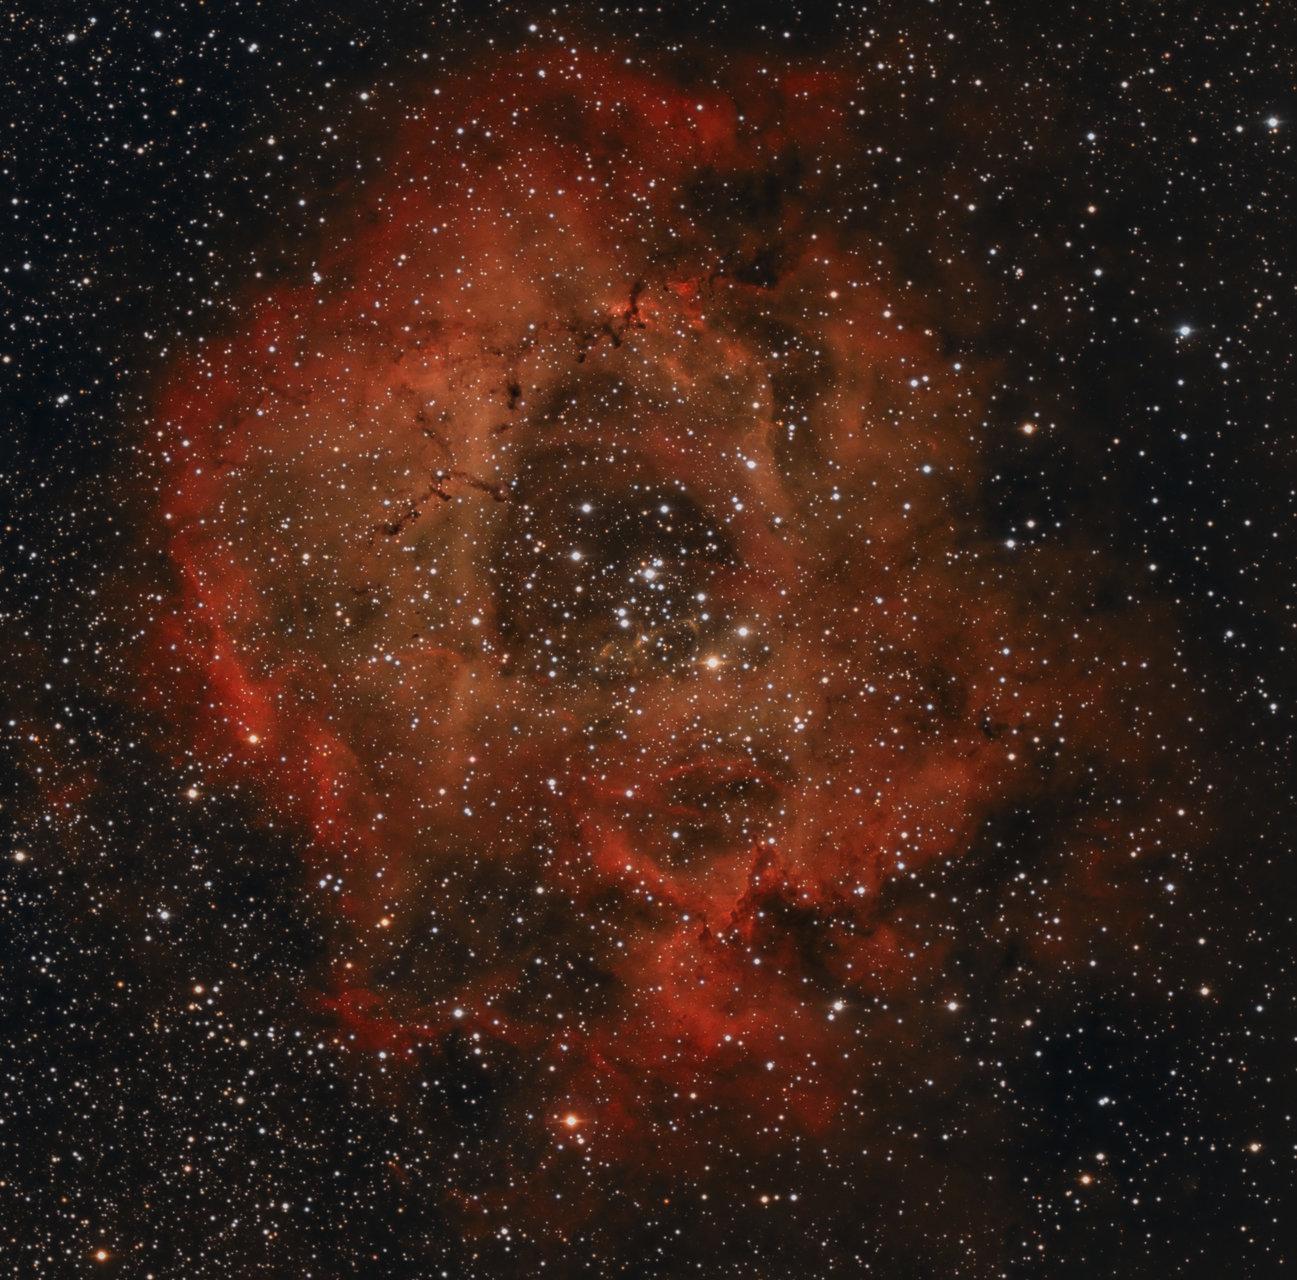 Caldwell 48 - Великата мъглявина Розетка | Author sektor | PHOTO FORUM